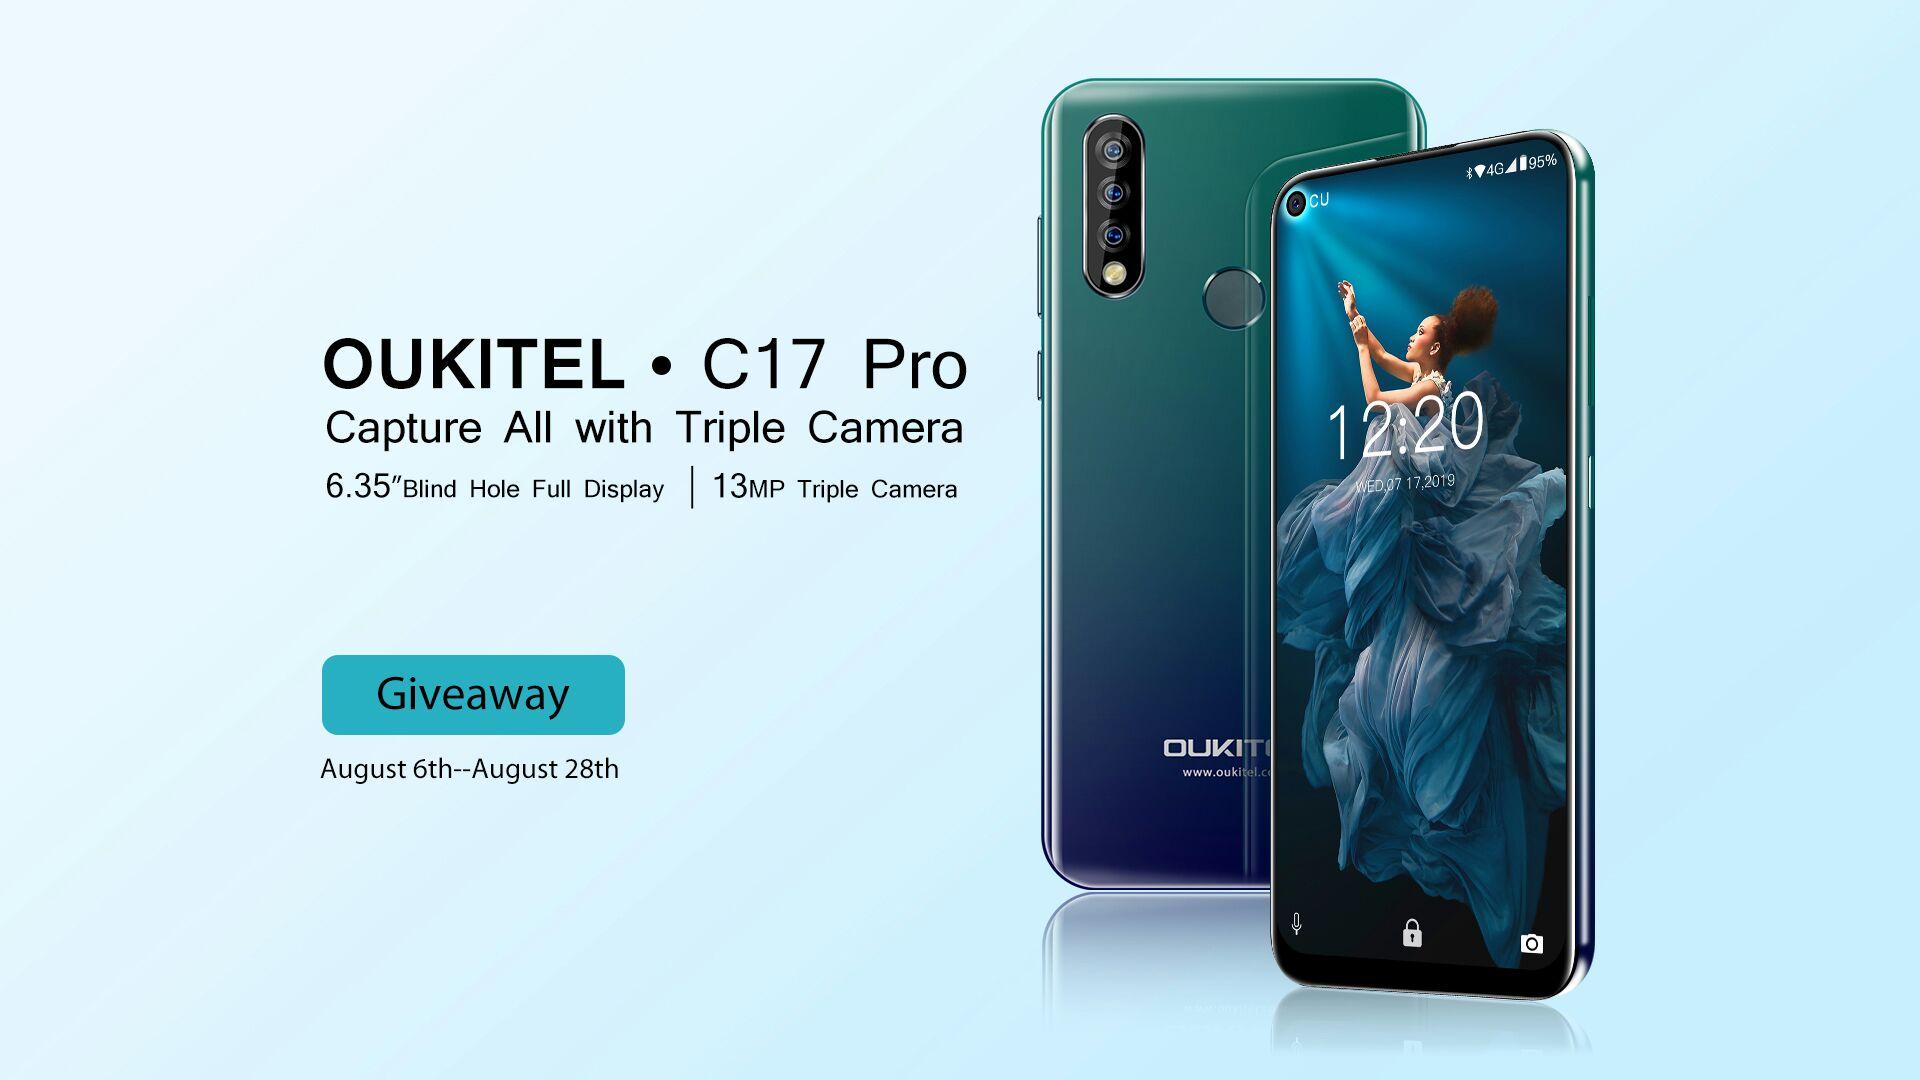 OUKITEL C17 Pro Launch Celebration Giveaway Image